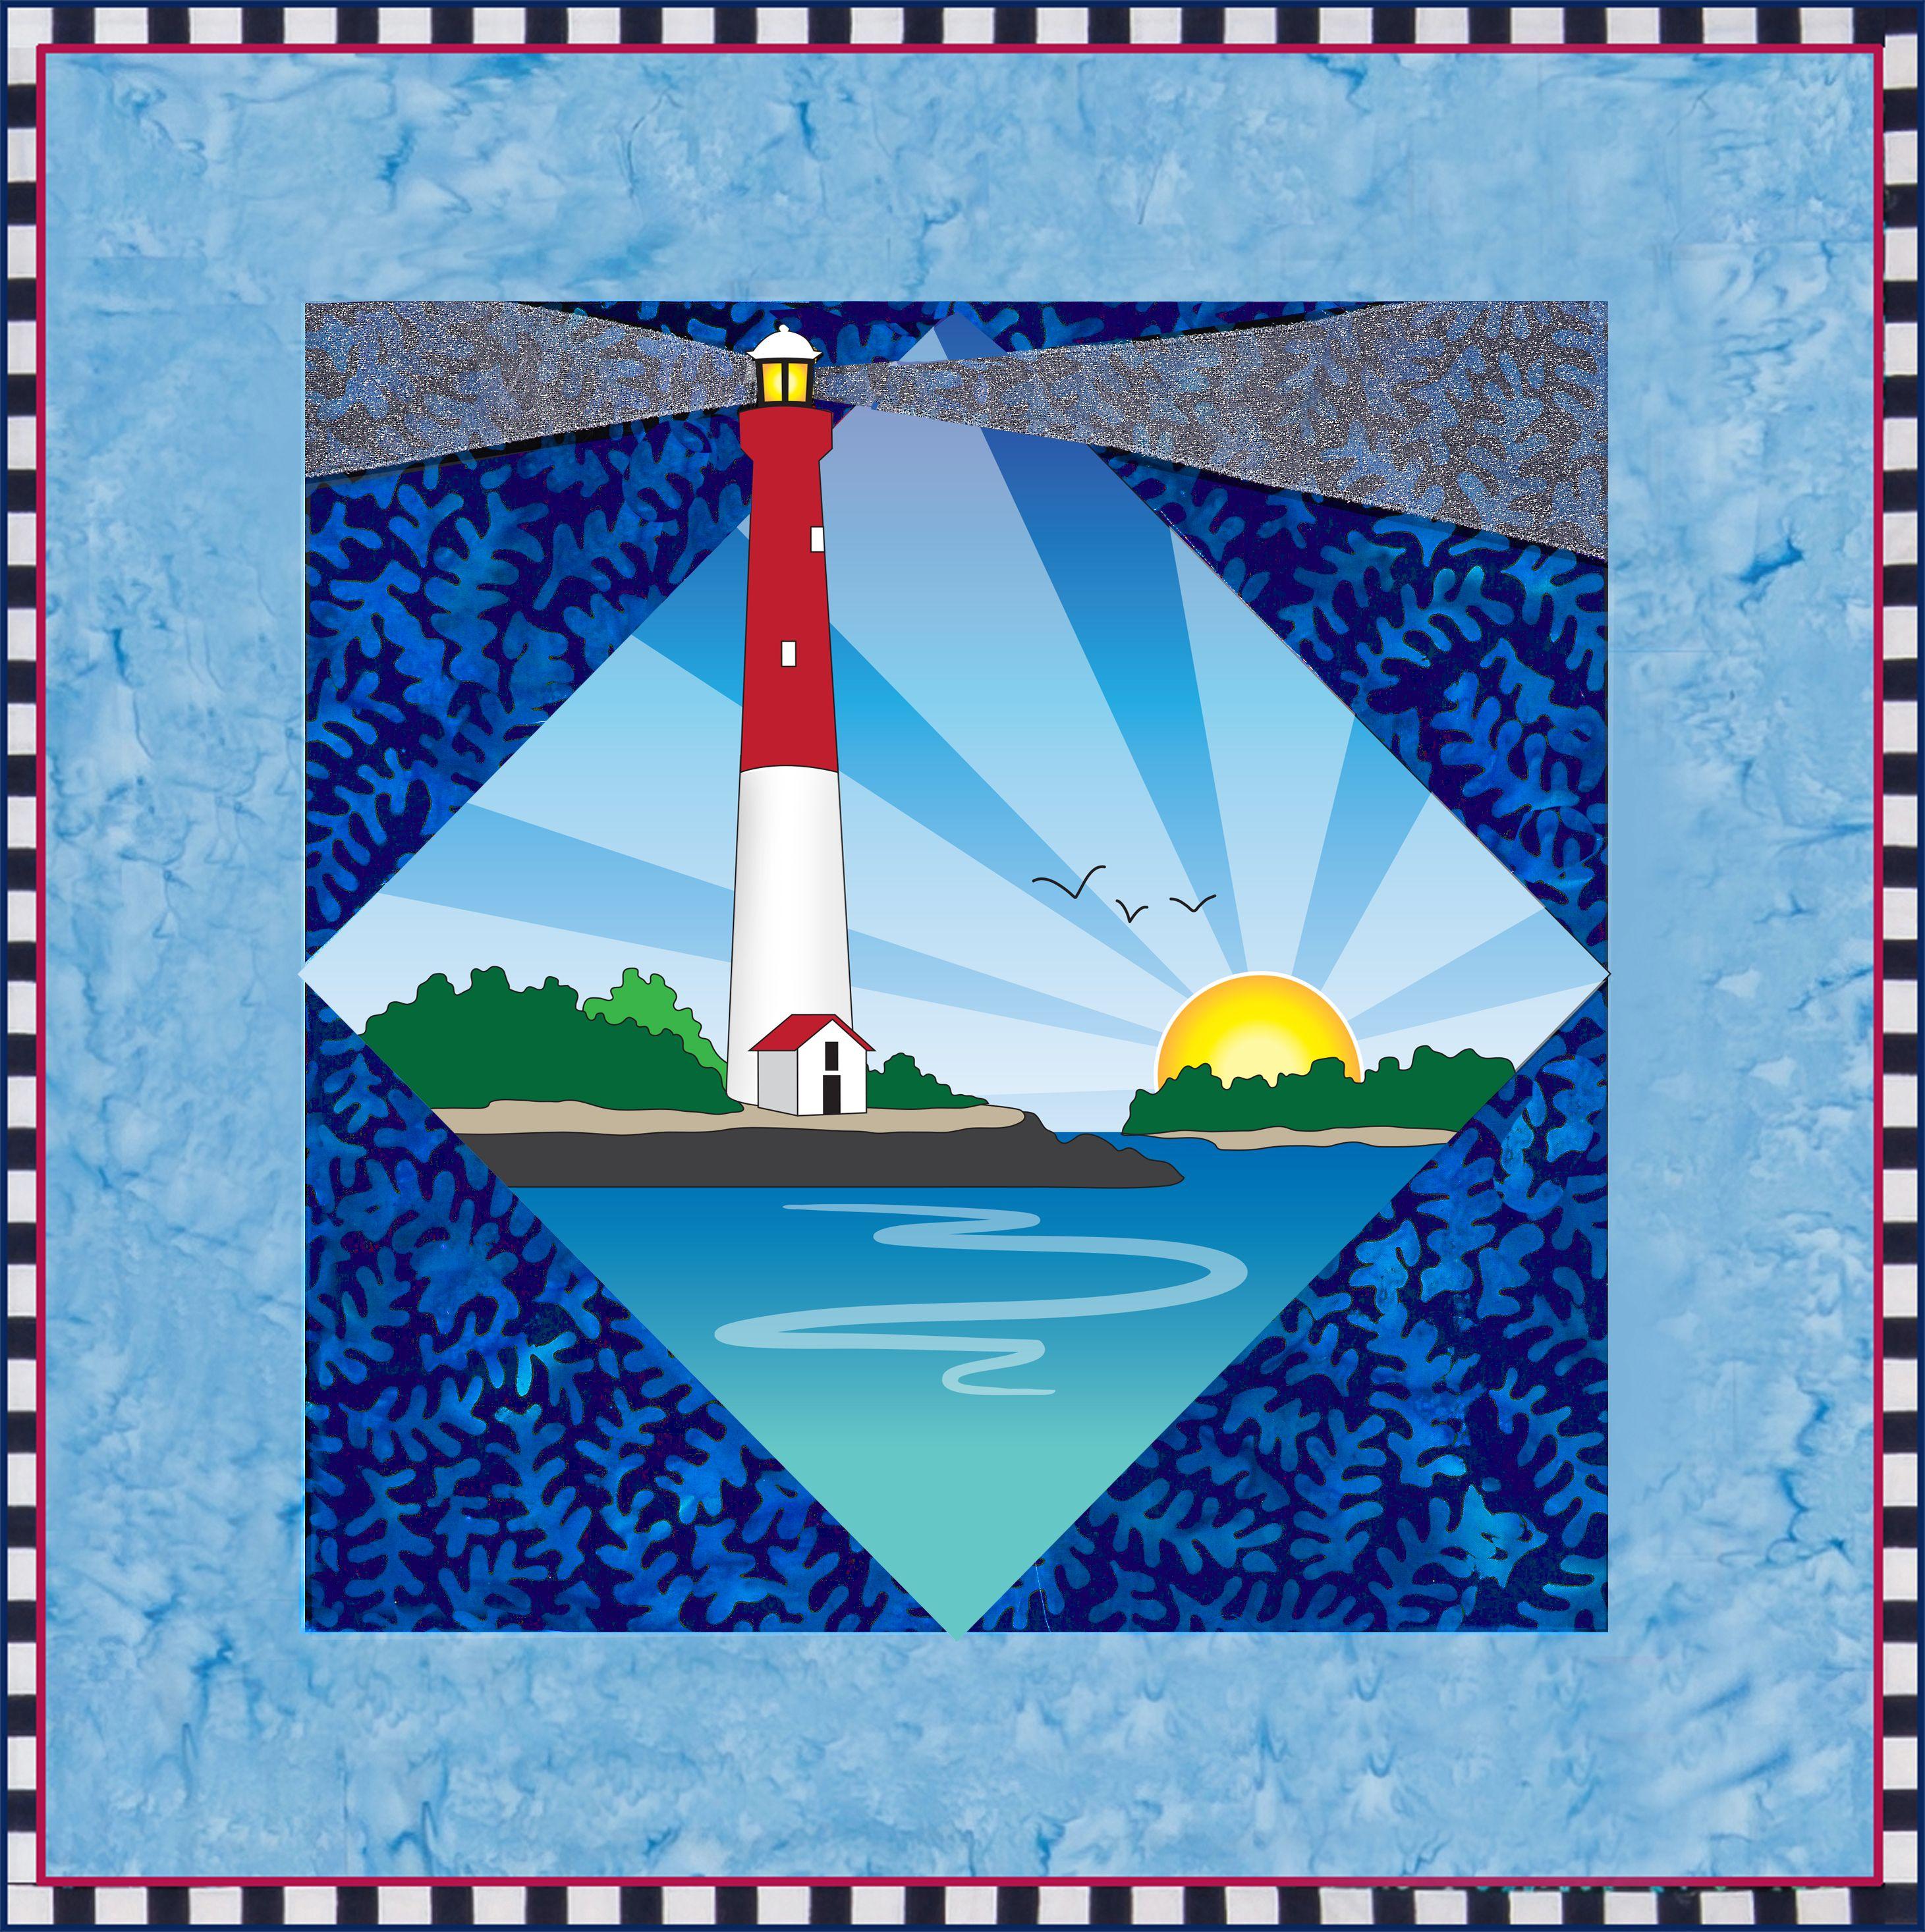 Barnagat Lighthouse Quilt Pattern By Debra Gabel Of Zebra Patterns